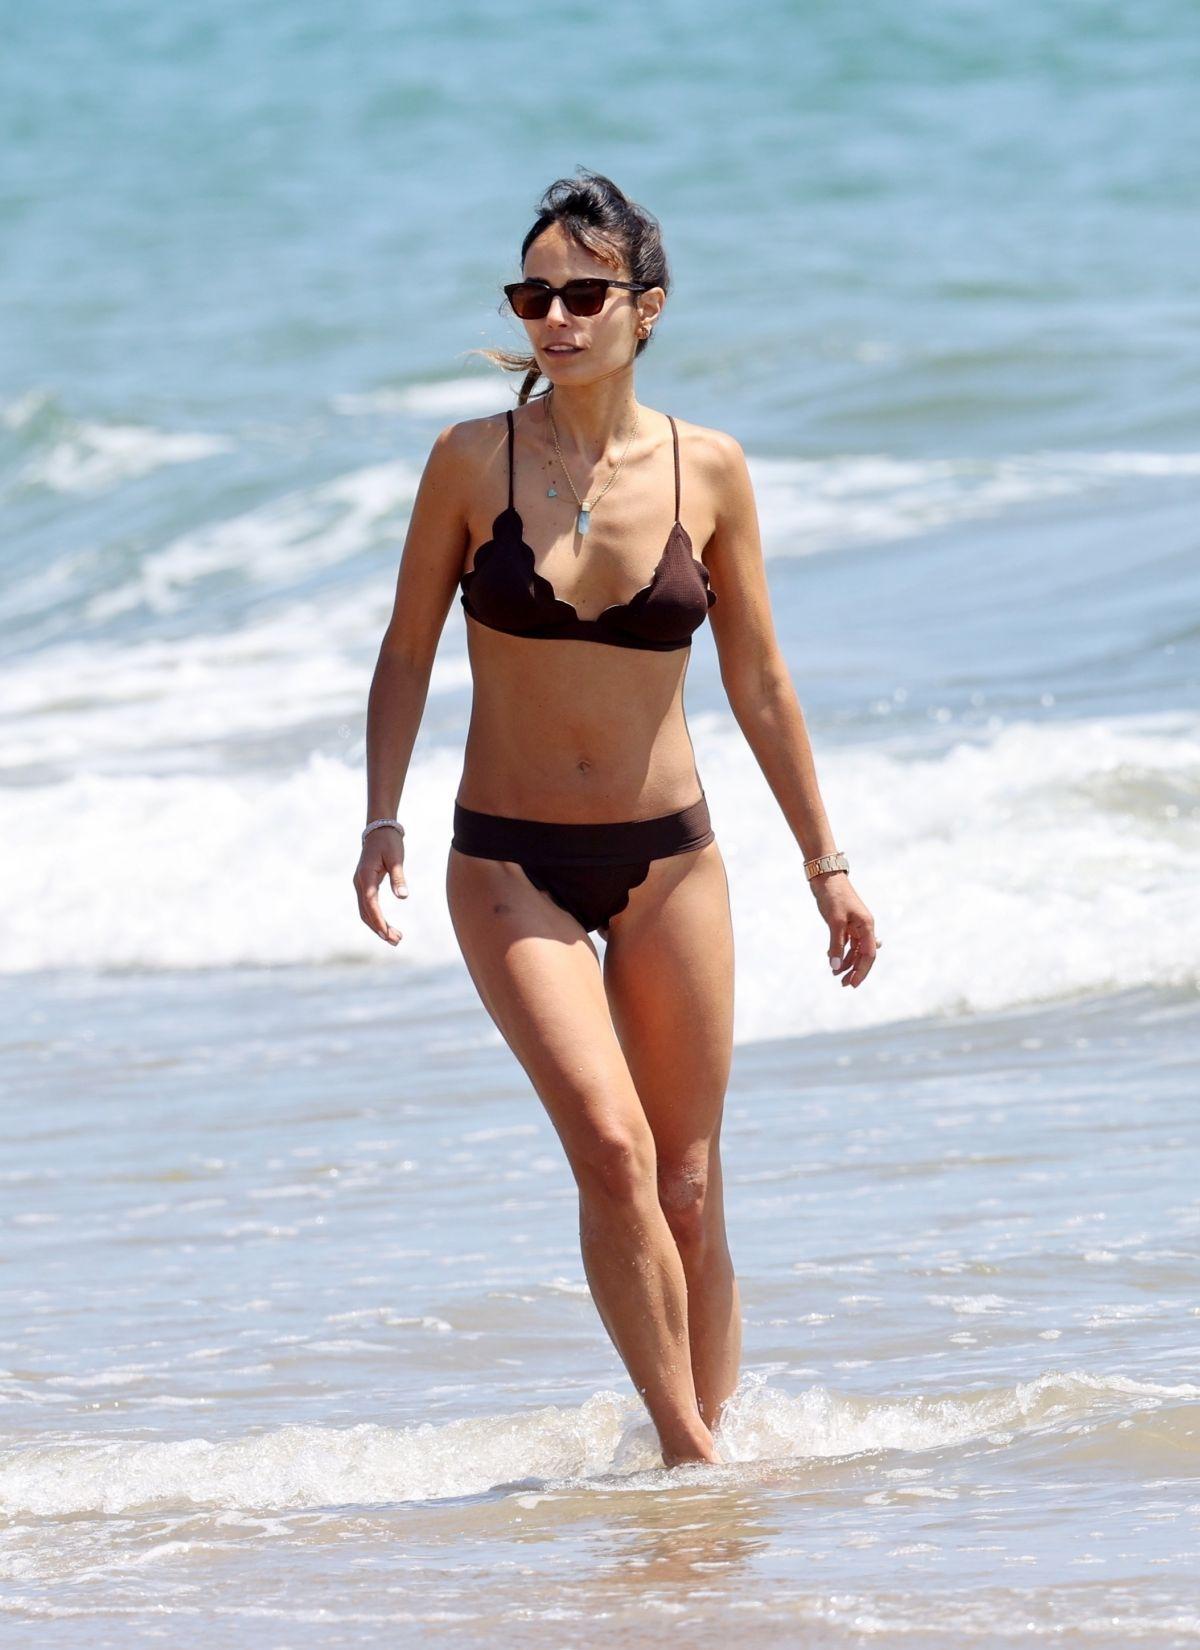 Nude on the beach movies